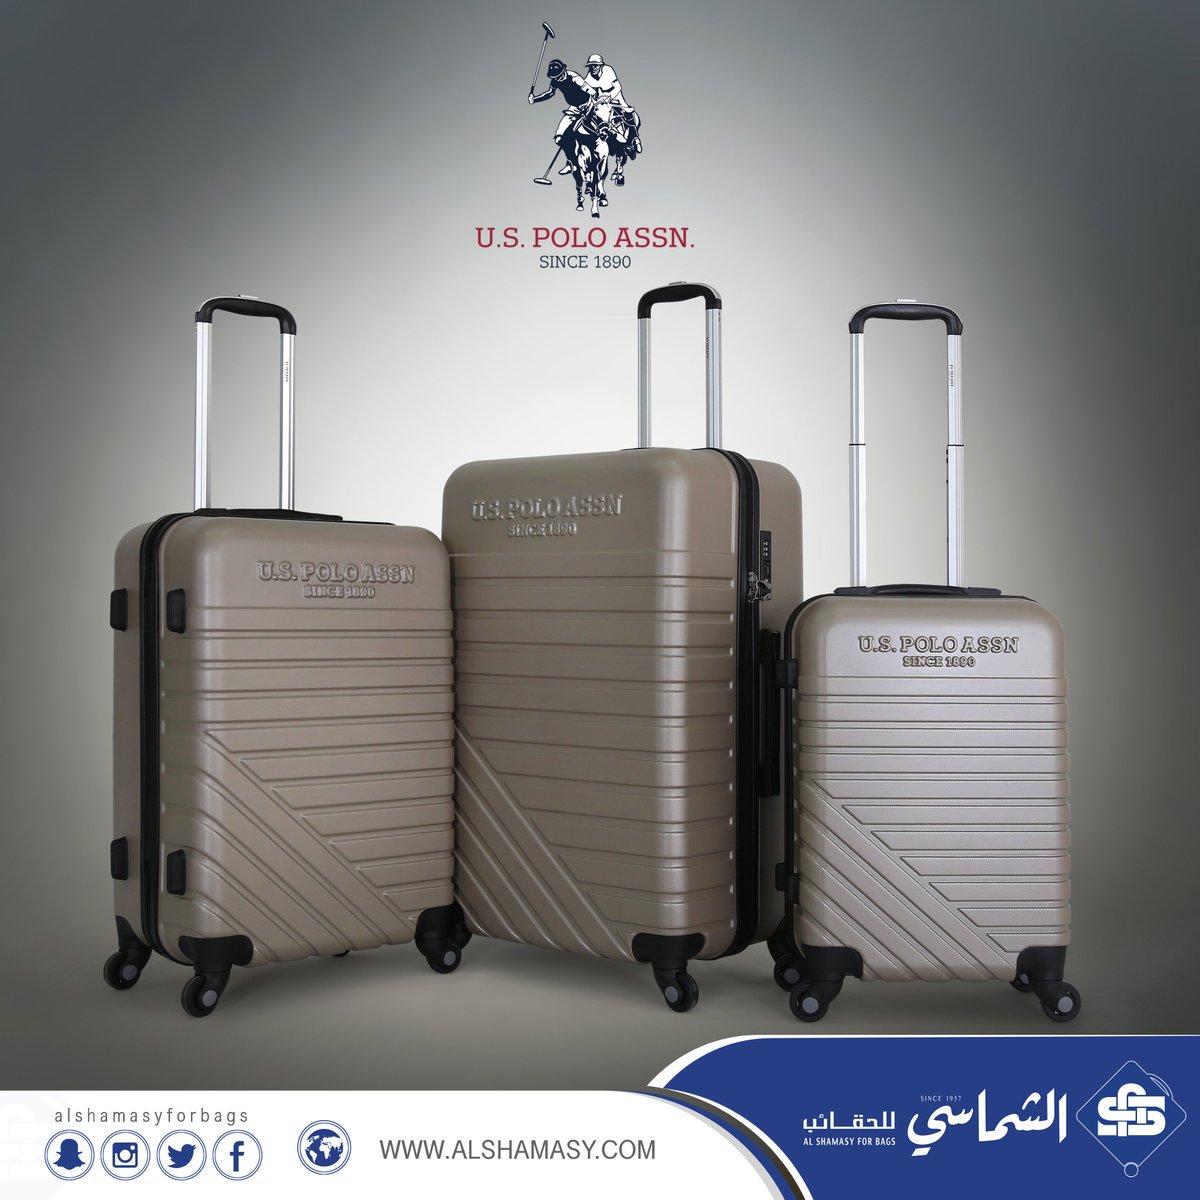 2573fc239 وصل حديثاً طقم حقائب سفر ماركة يو اس بولو اسسن ثلاث حقائب سفر مصنوعة من  البولي